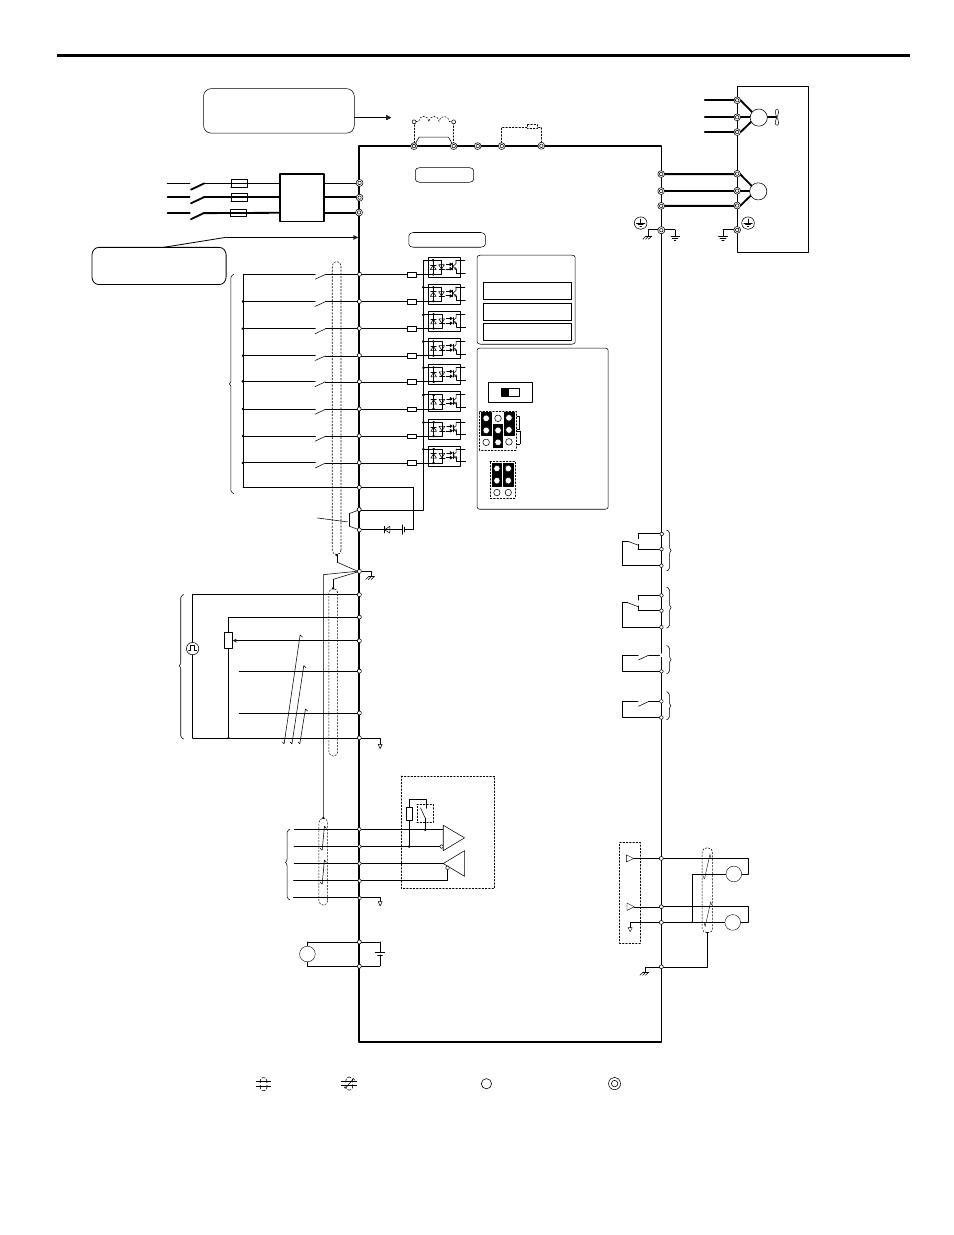 p1000 drive, i.3 electrical installation safety | yaskawa cimr-pu ... yaskawa wiring diagram  manuals directory